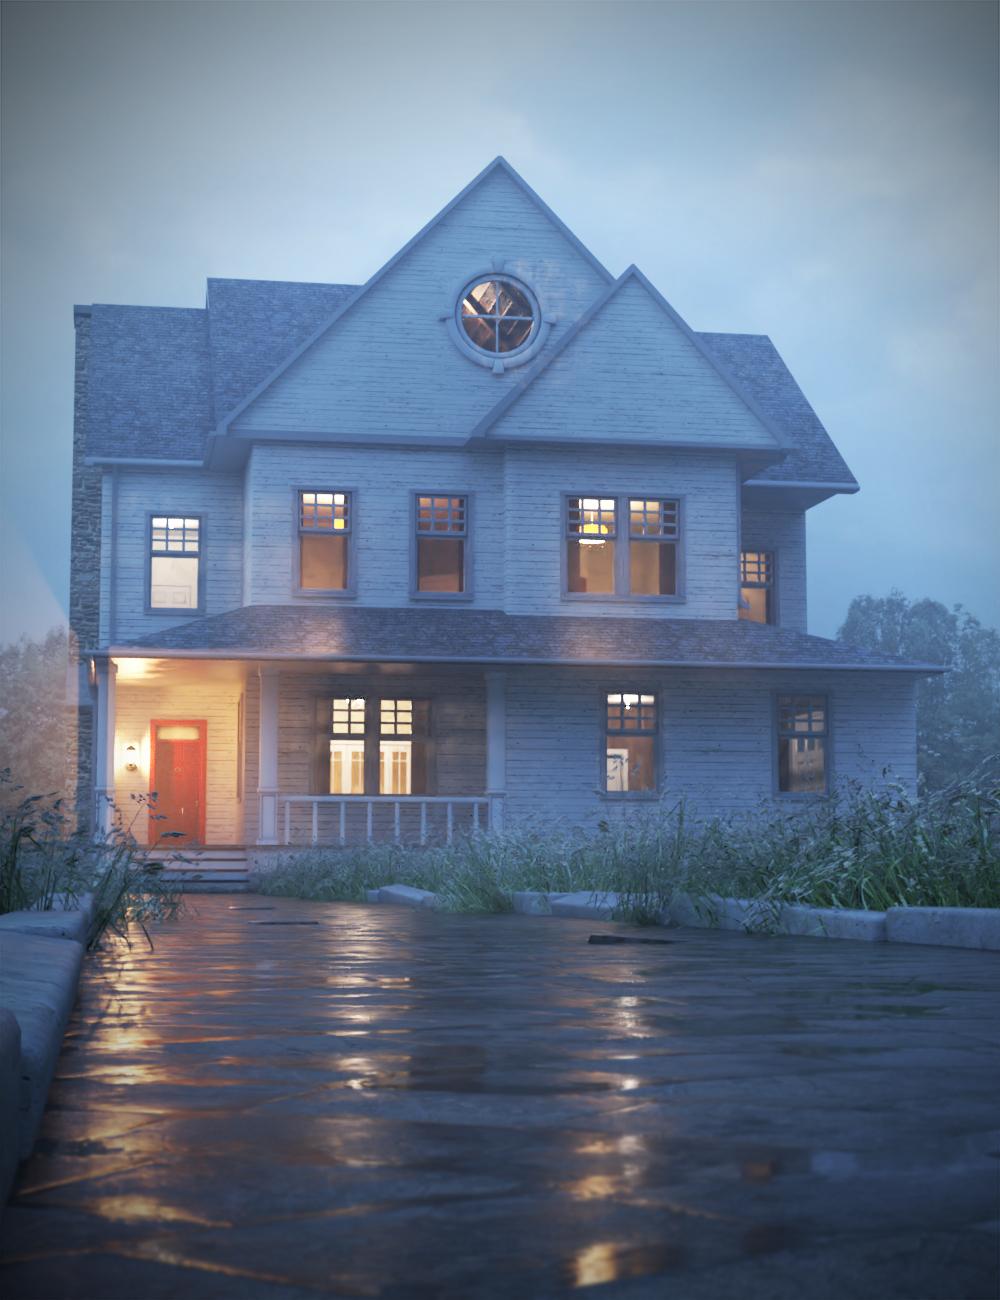 Harwood House by: KindredArts, 3D Models by Daz 3D